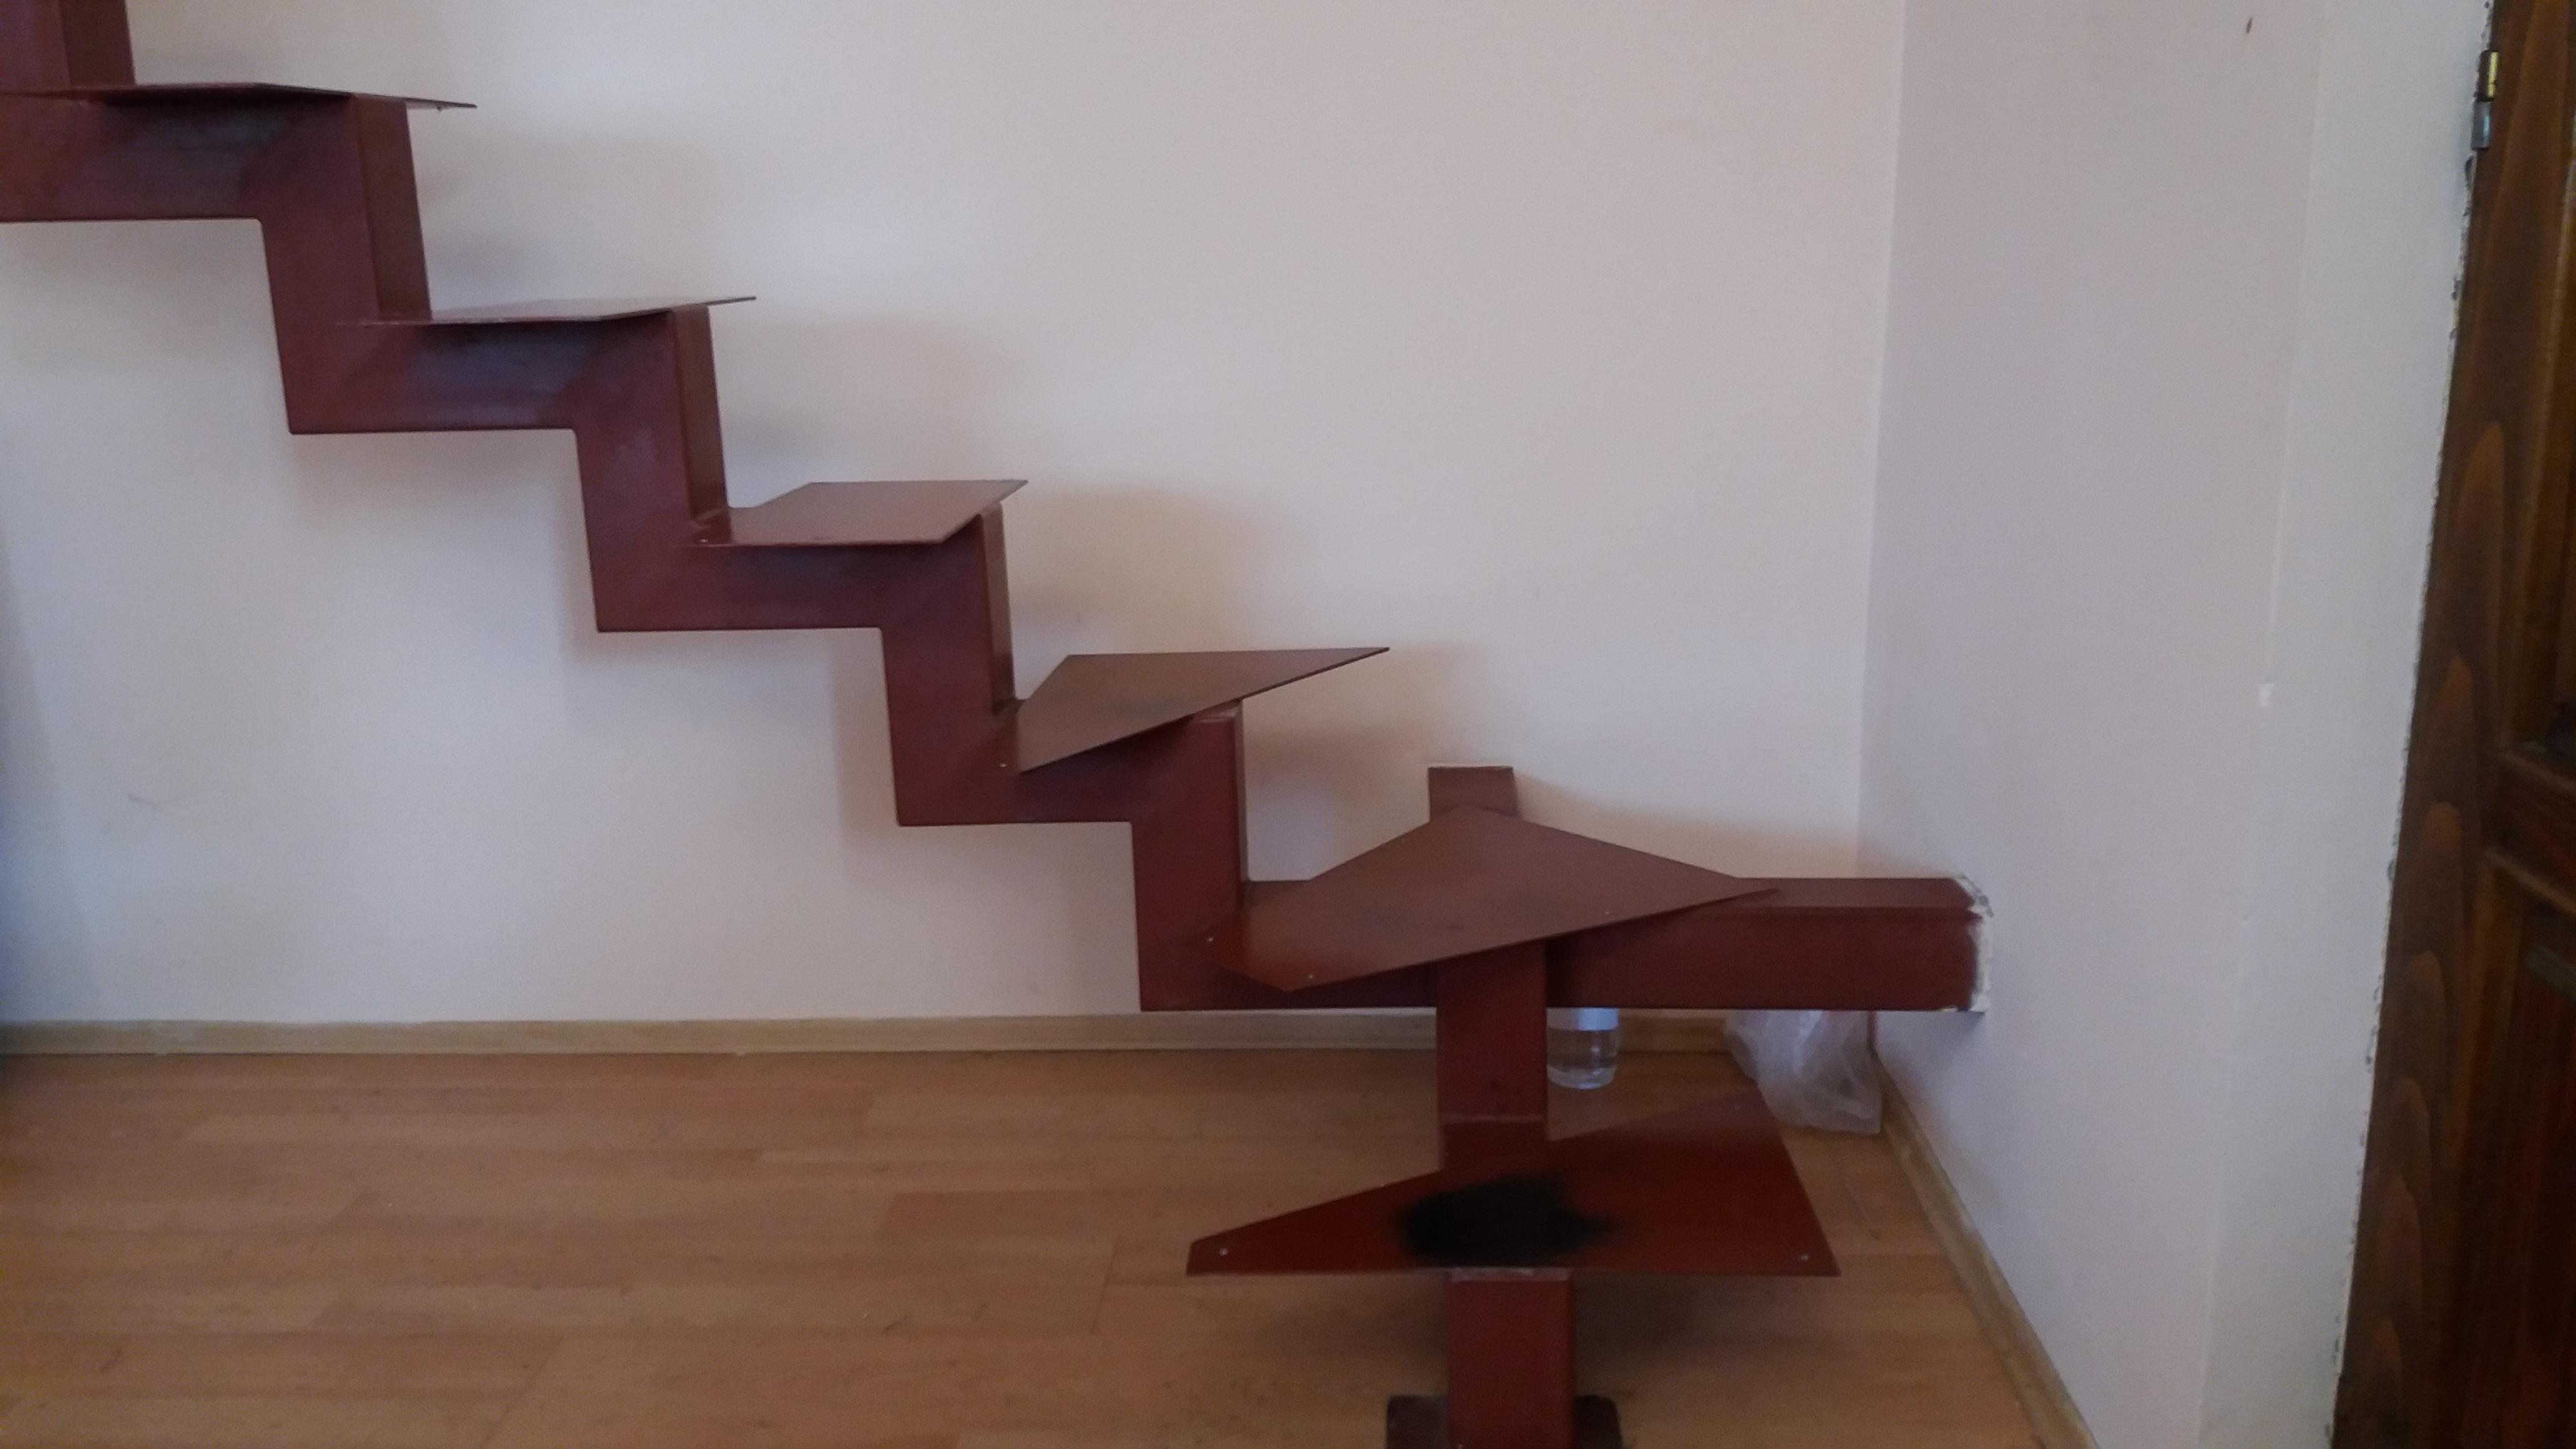 Konstrukcija za stepenice